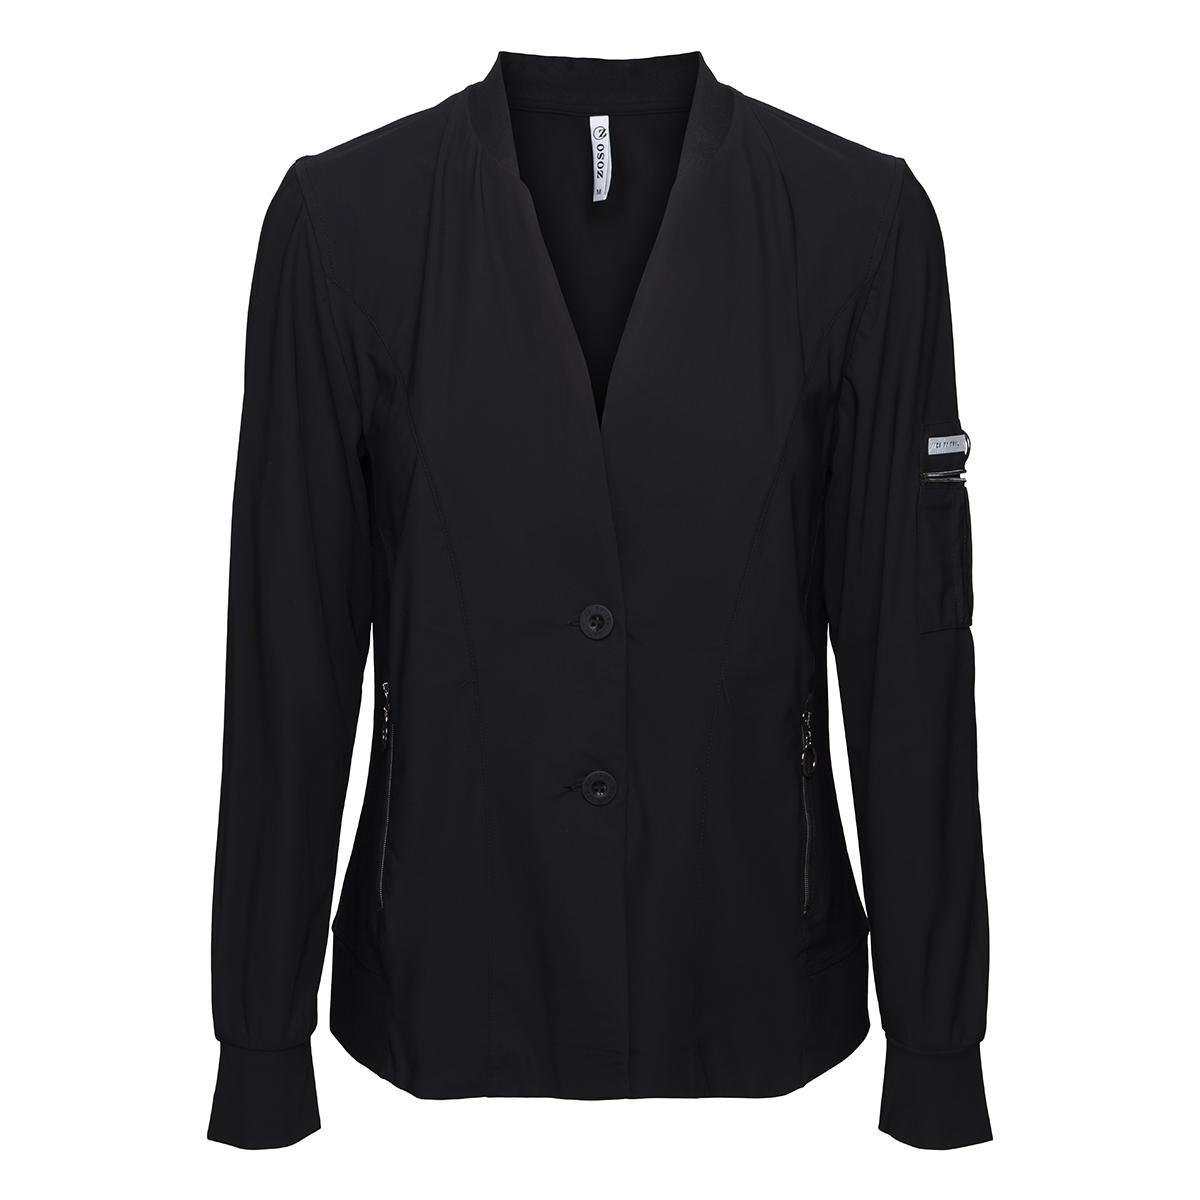 daisy 194 travel jacket zoso blazer black